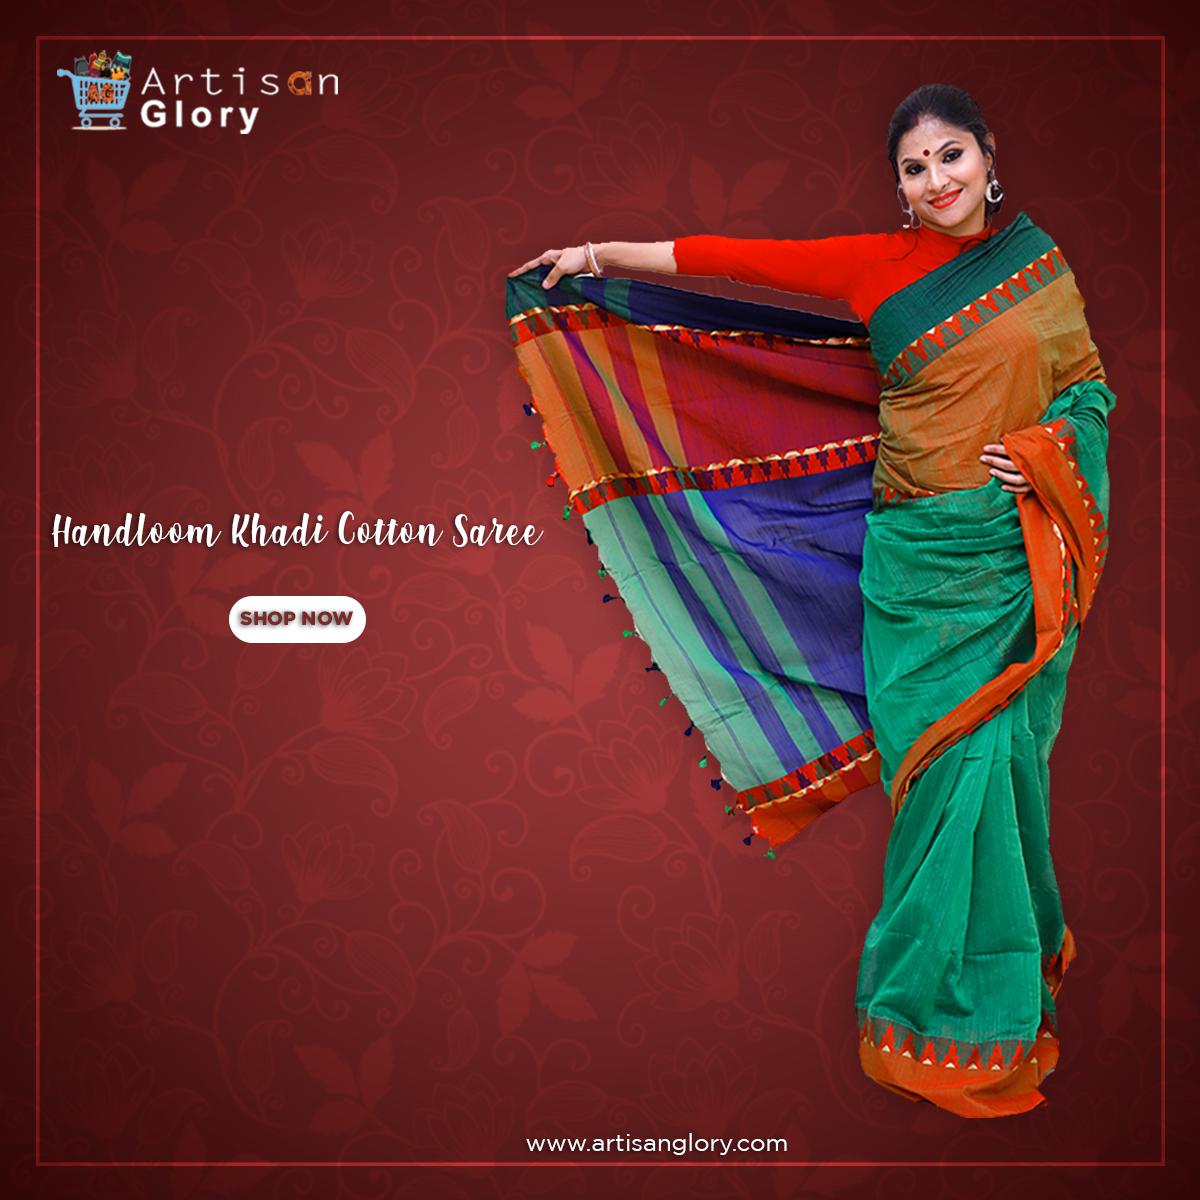 Shop Online: http://www.artisanglory.com #handloom #handloomsaree #templedesign #khadicottonsaree #cottonsaree #khadisaree #saree #onlineshopping #stitchedsaree #khadisareepic.twitter.com/pXmxKPBuhn